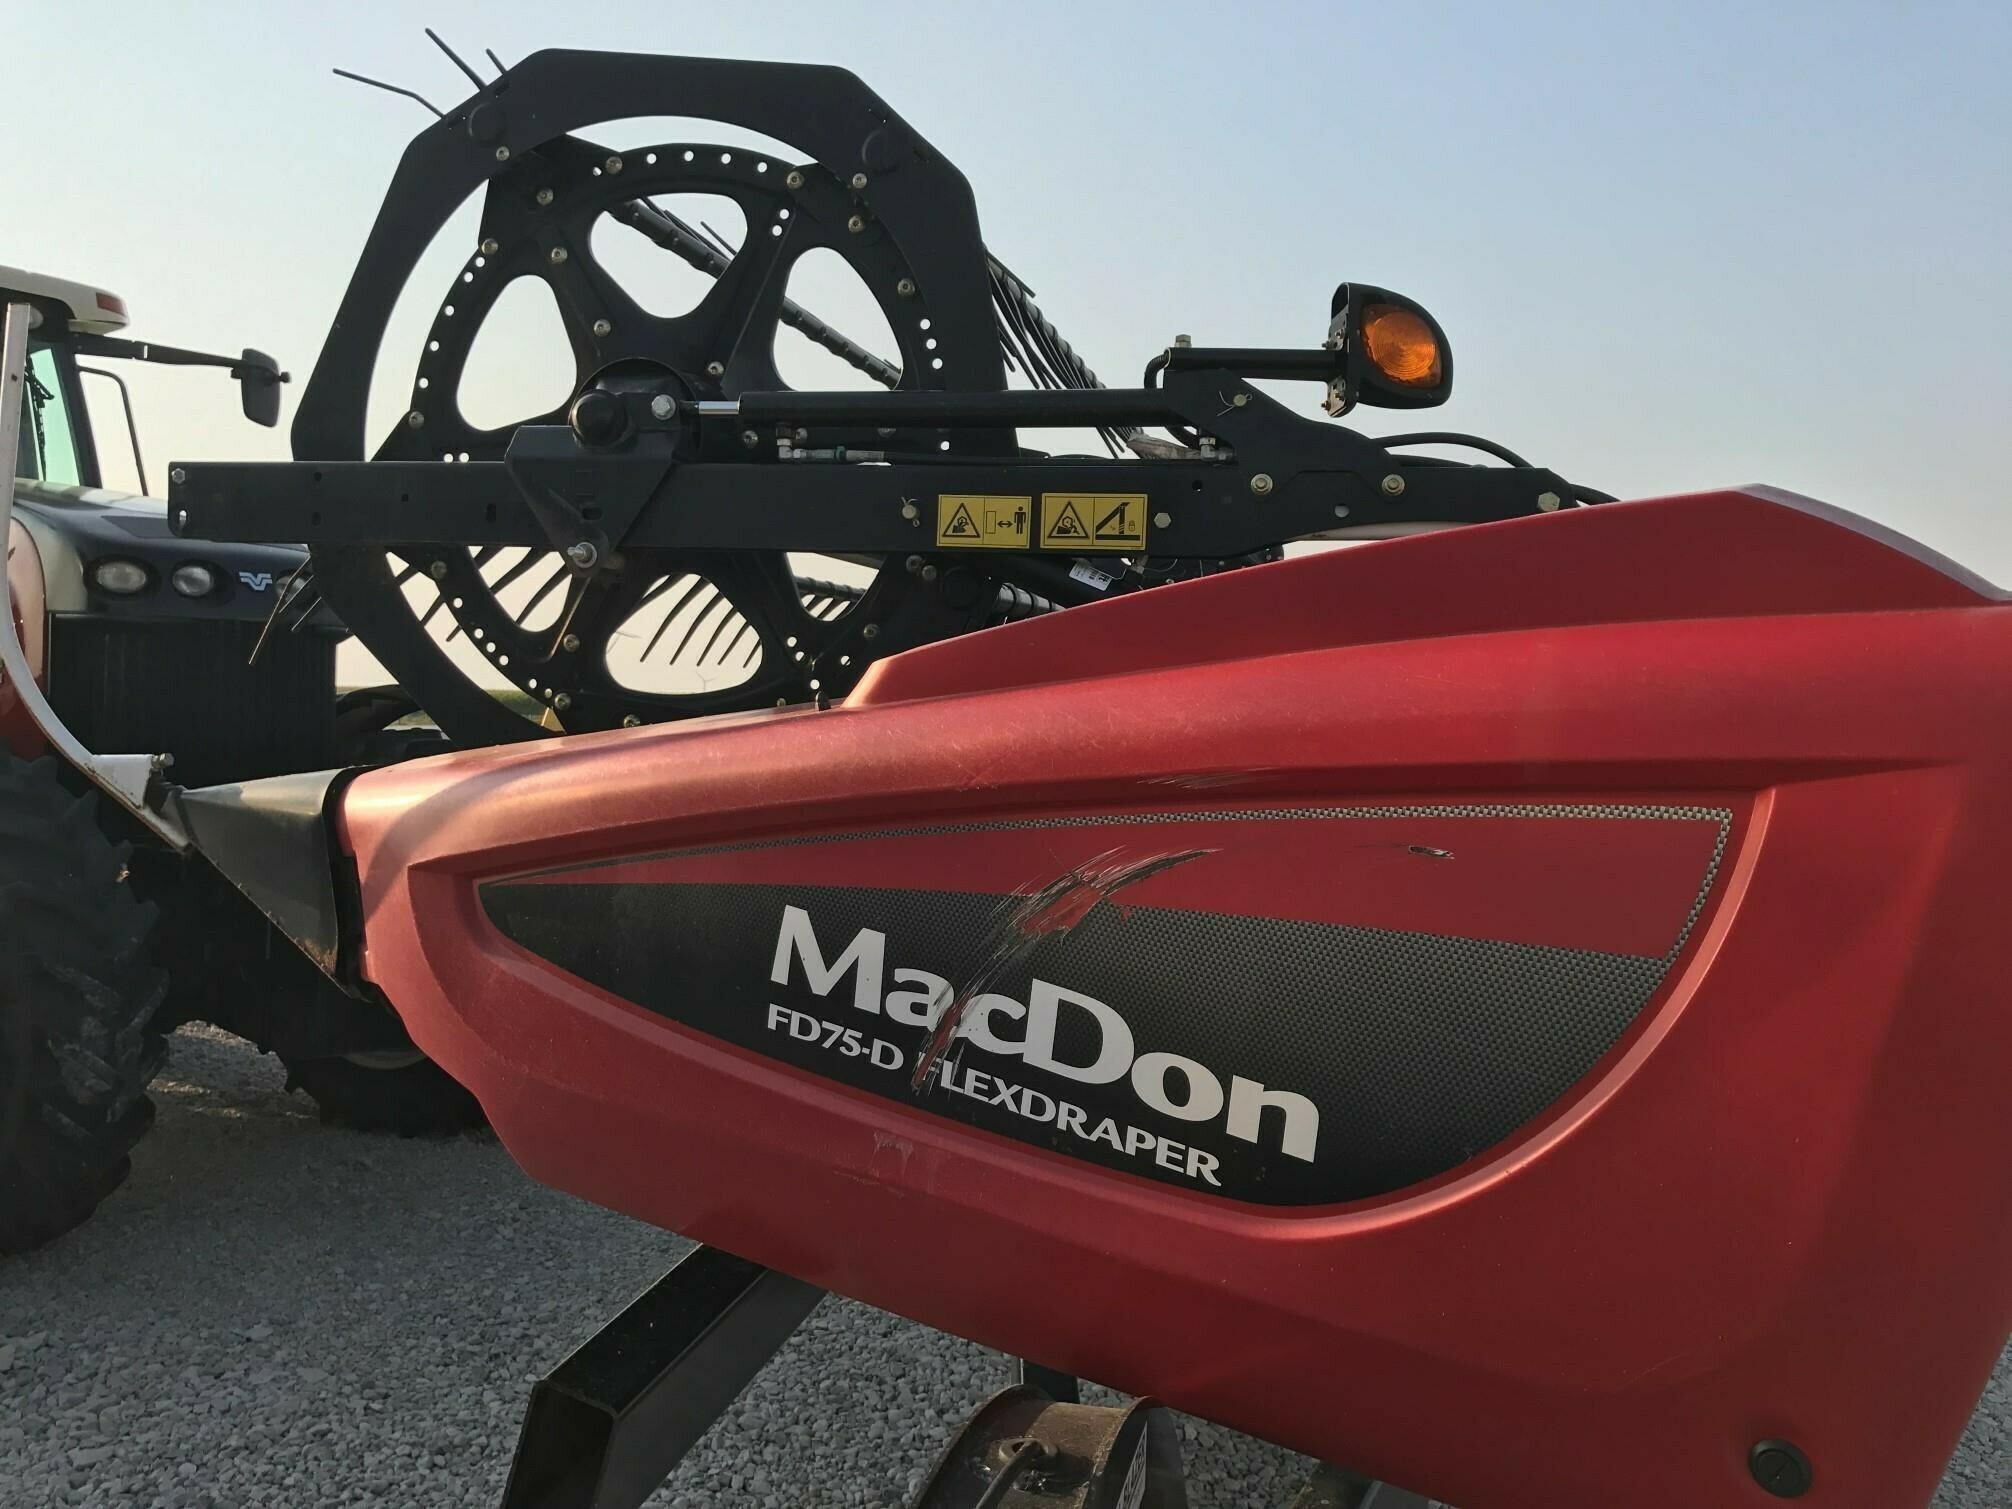 2014 MacDon FD75D Platform